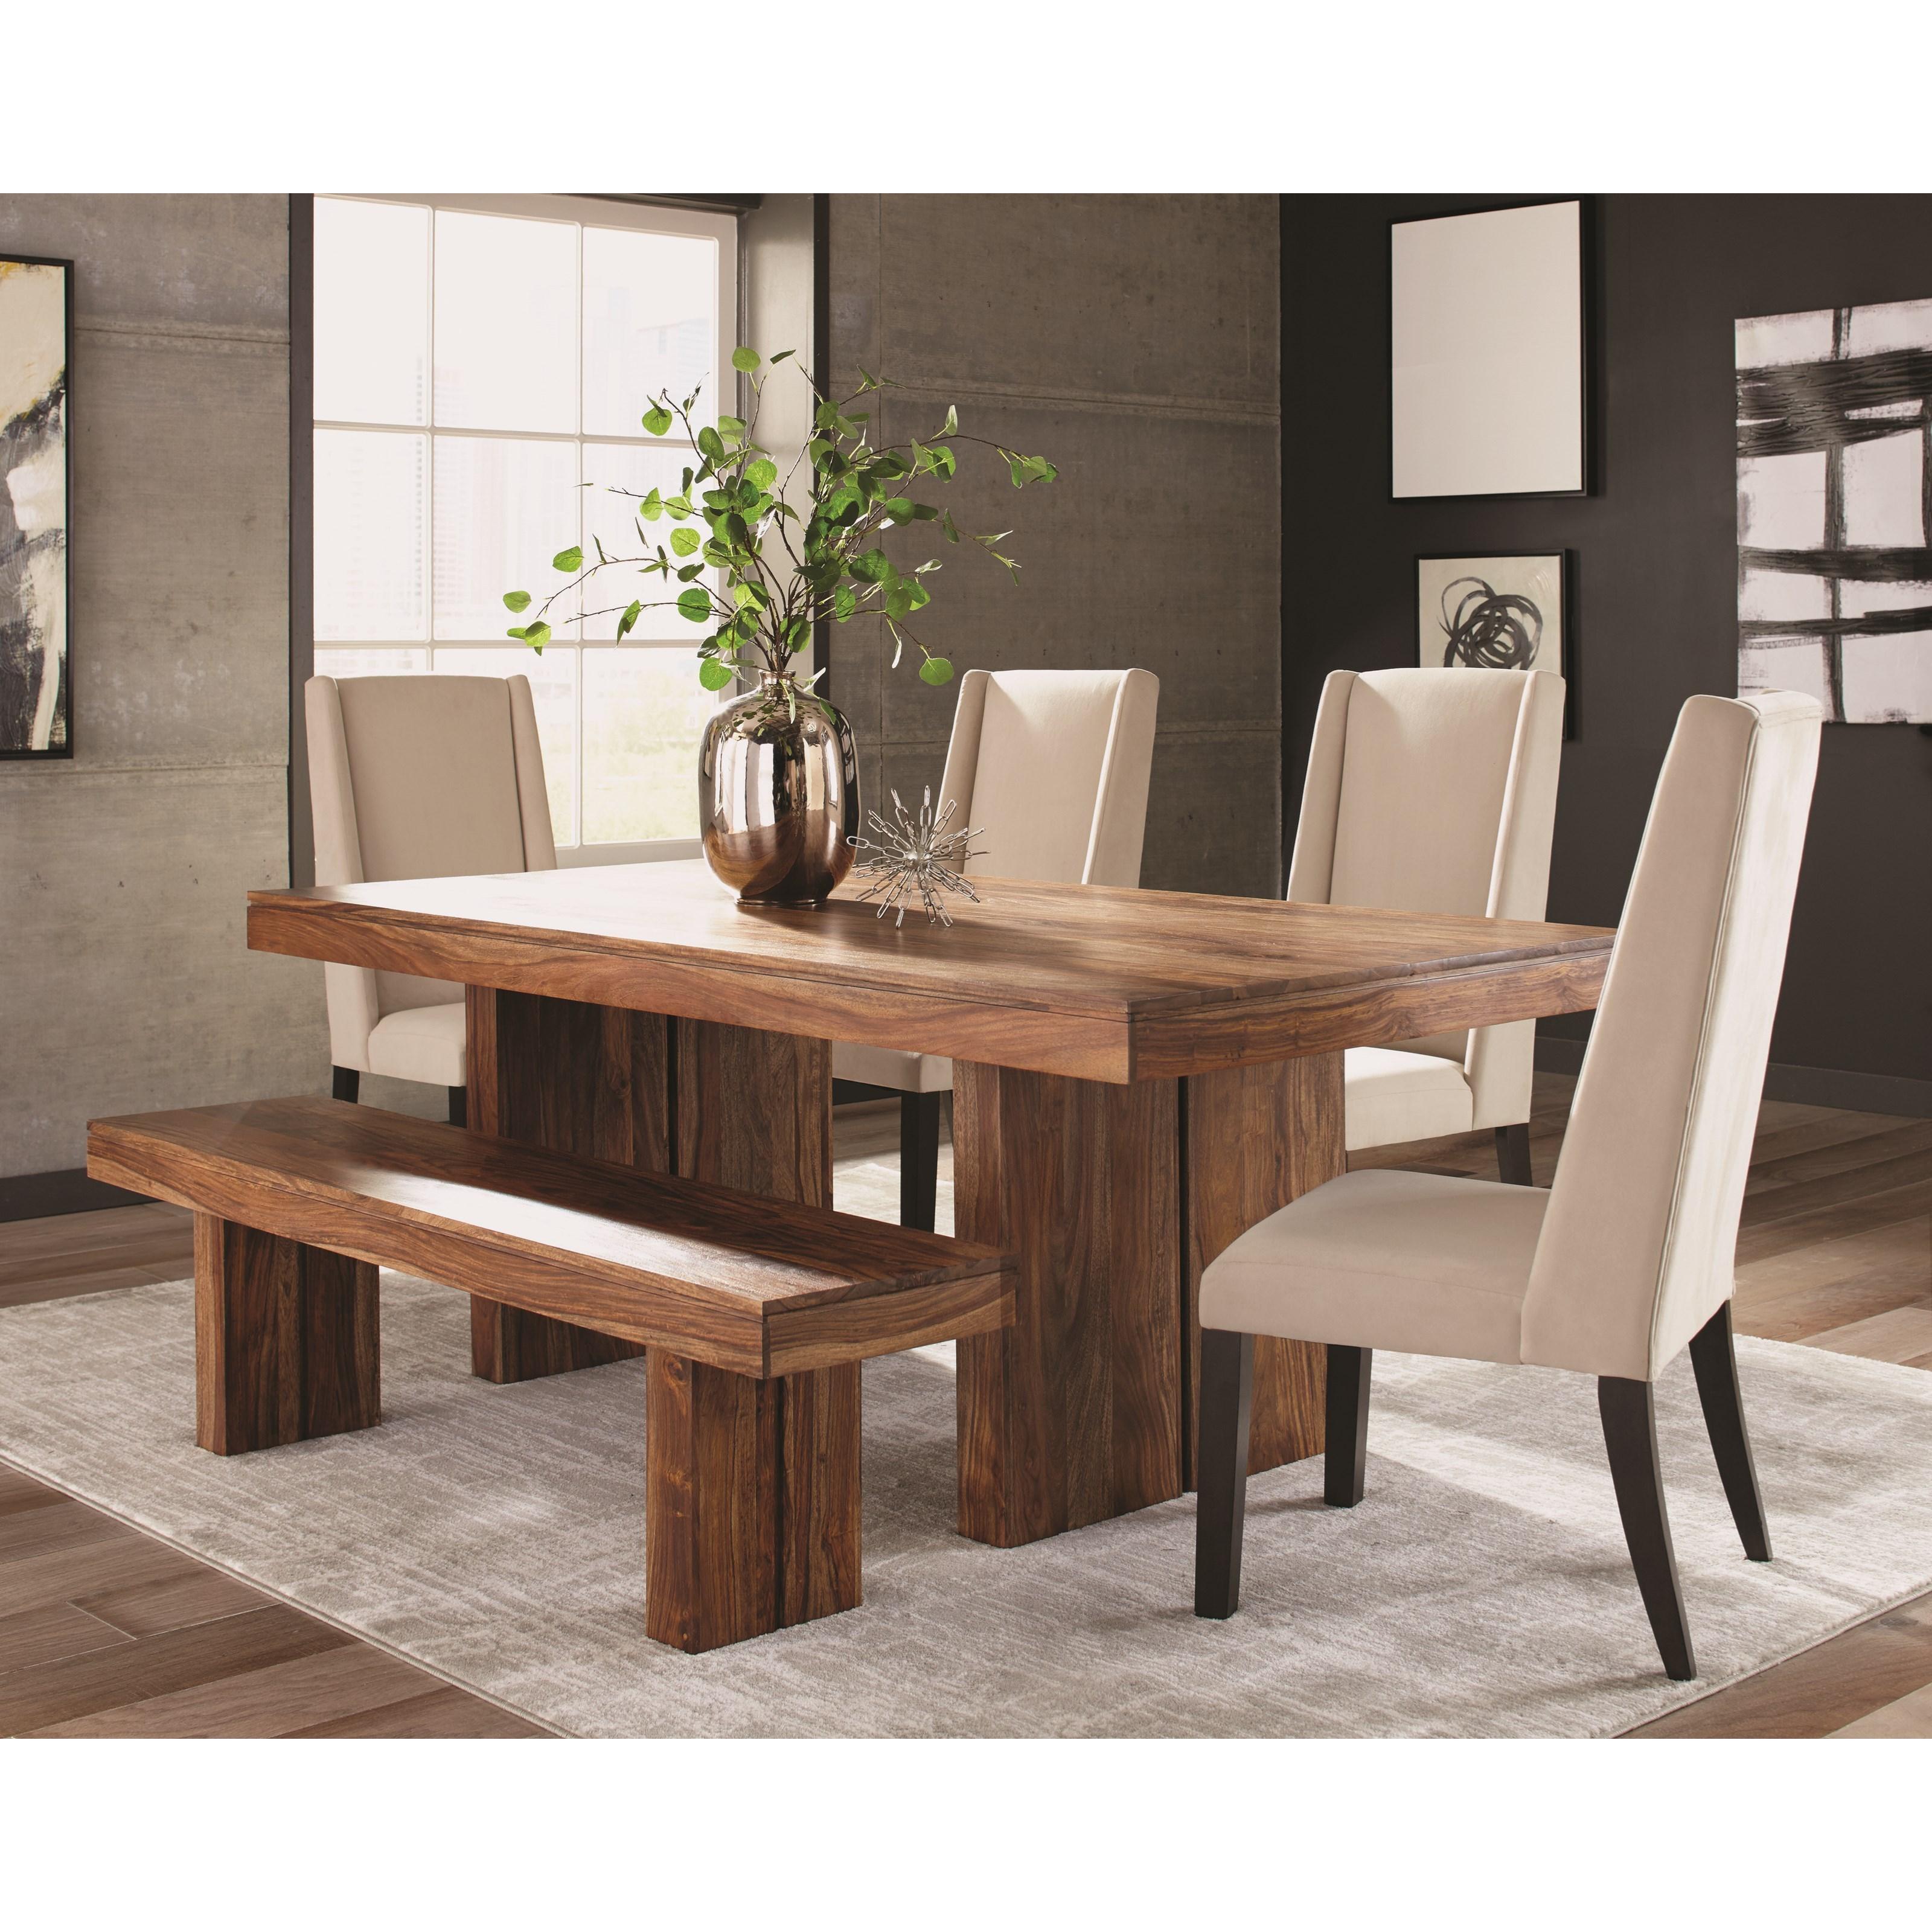 Ordinaire Rustic Sheesham Wood Dining Table